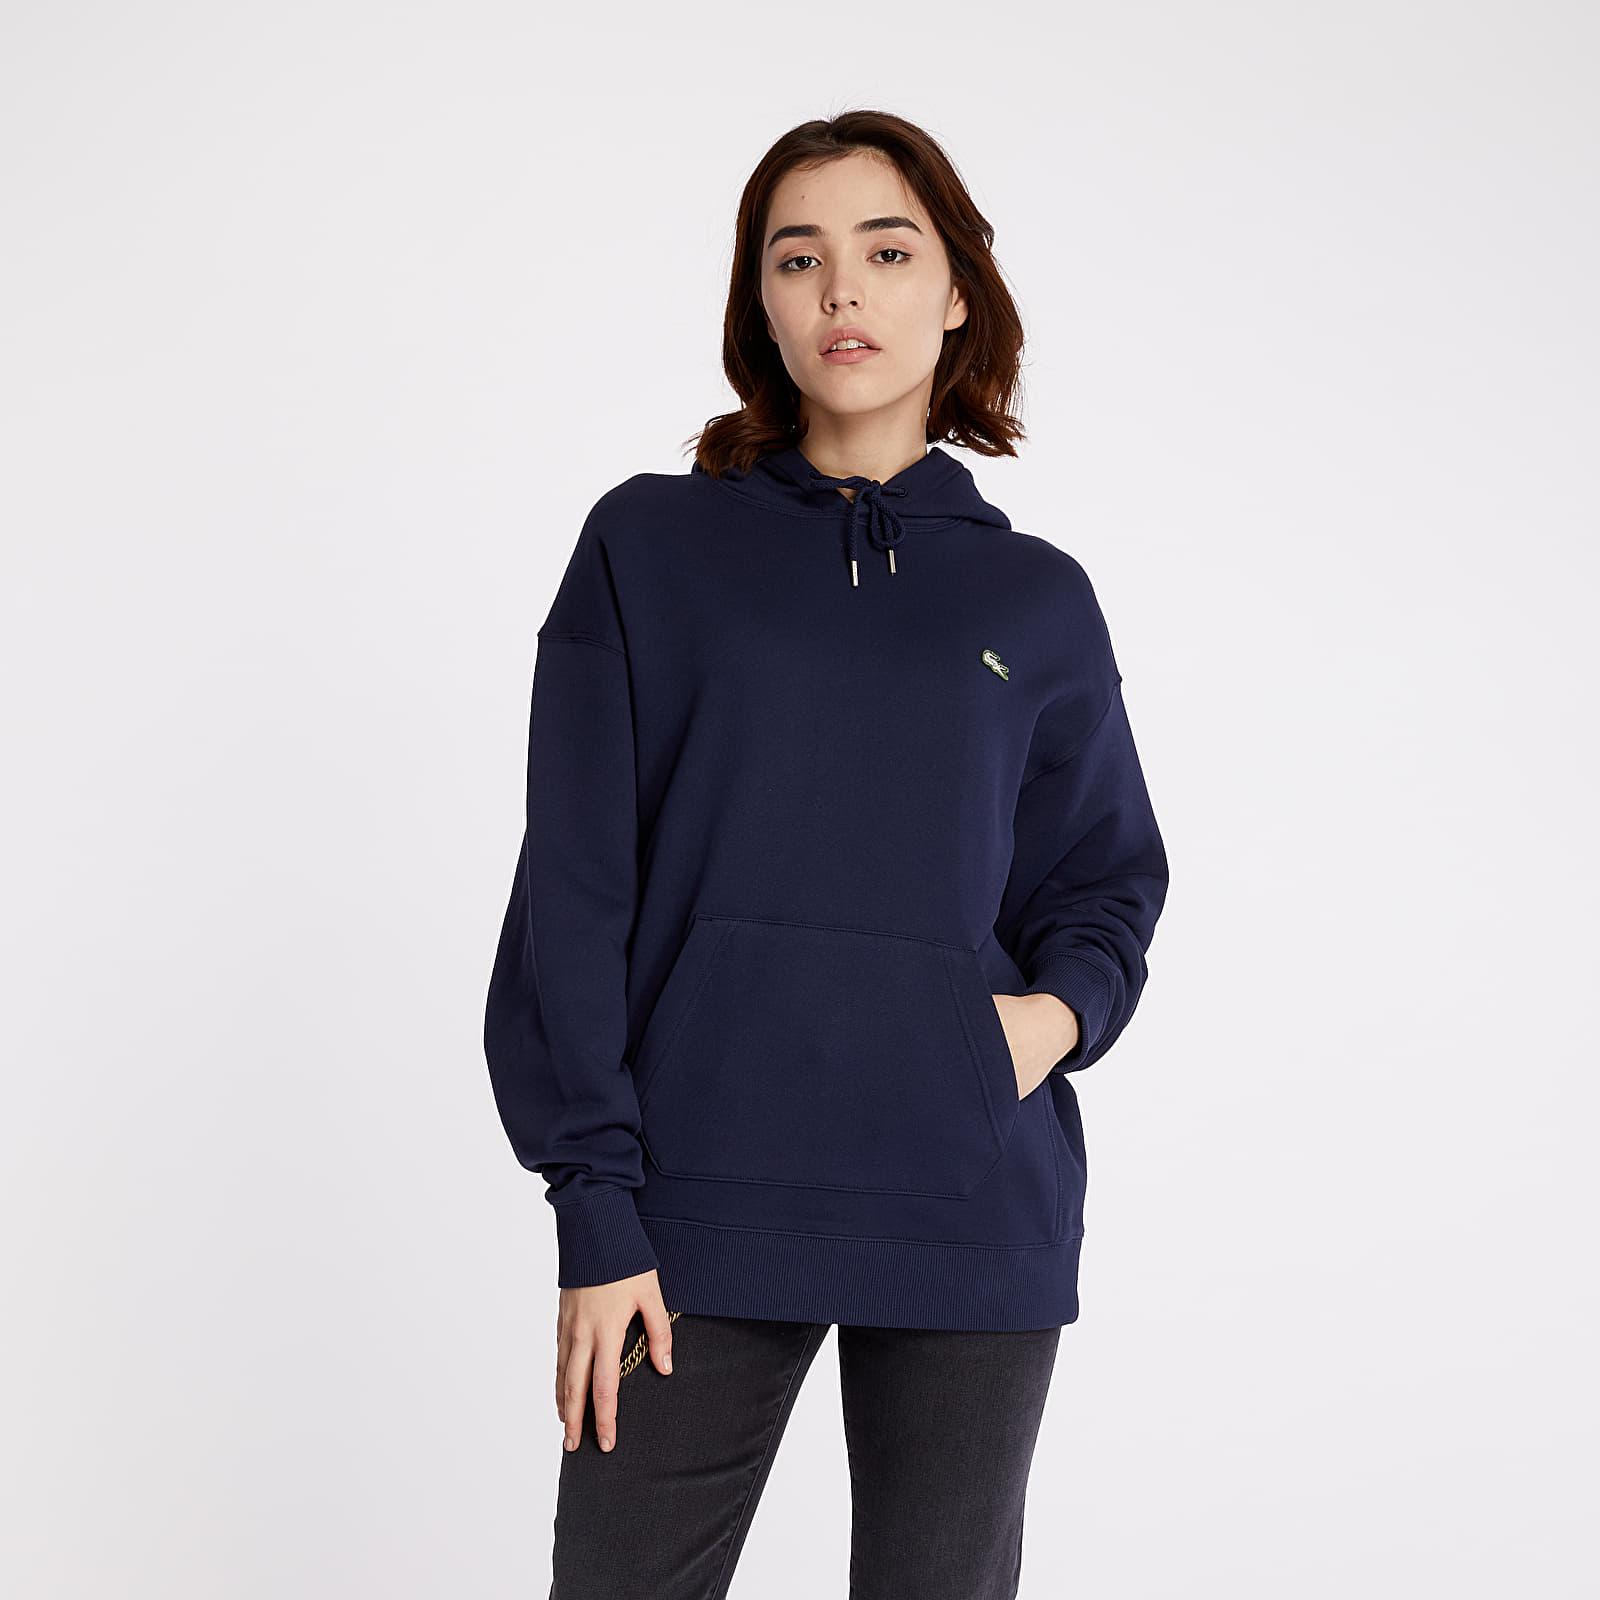 Sweatshirts LACOSTE LIVE Kangaroo Pocket Hoodie Navy